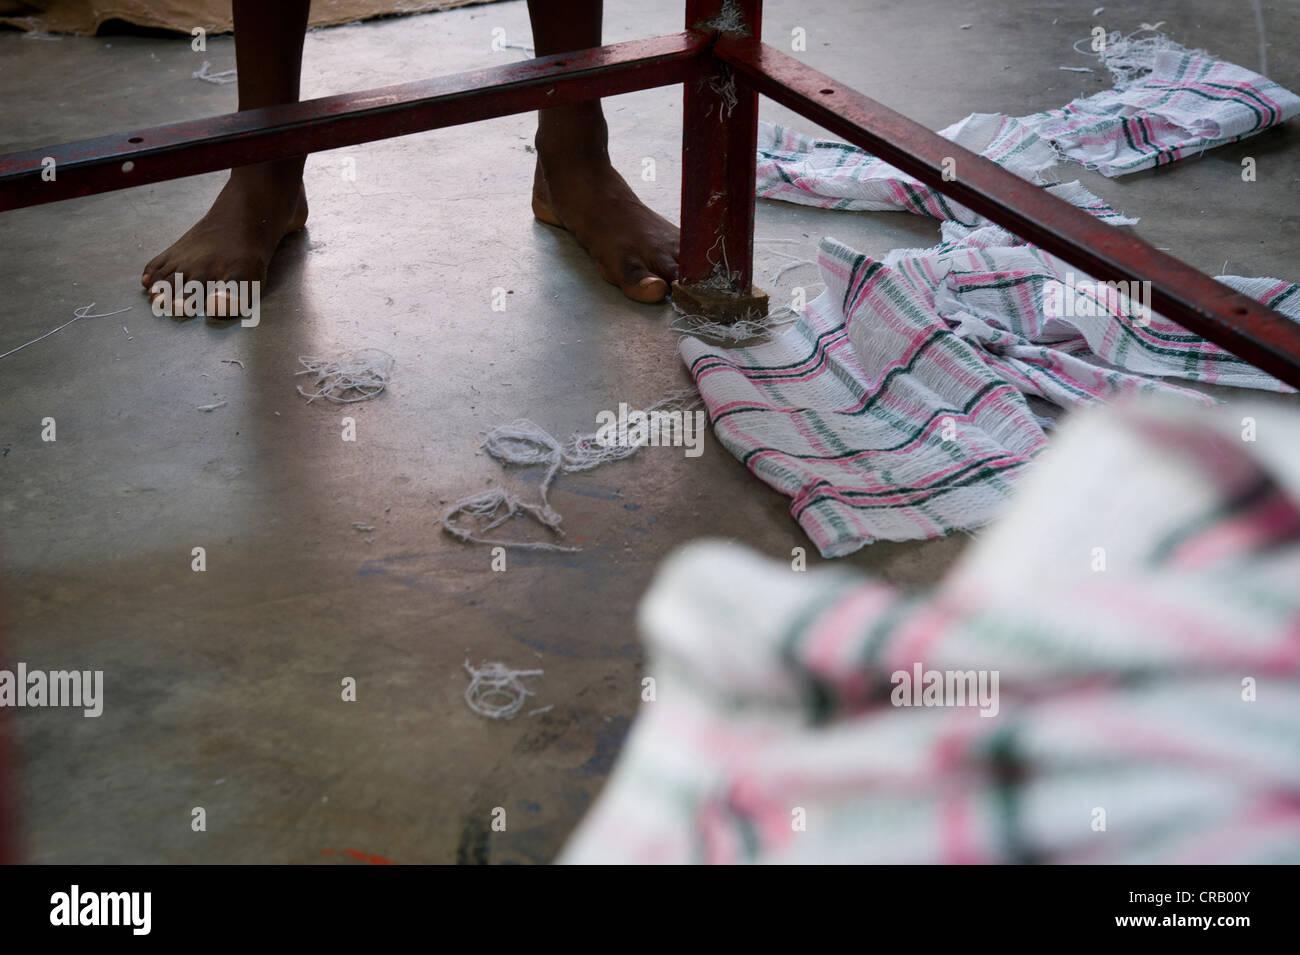 Child labor, Karur, Tamil Nadu, India, Asia - Stock Image